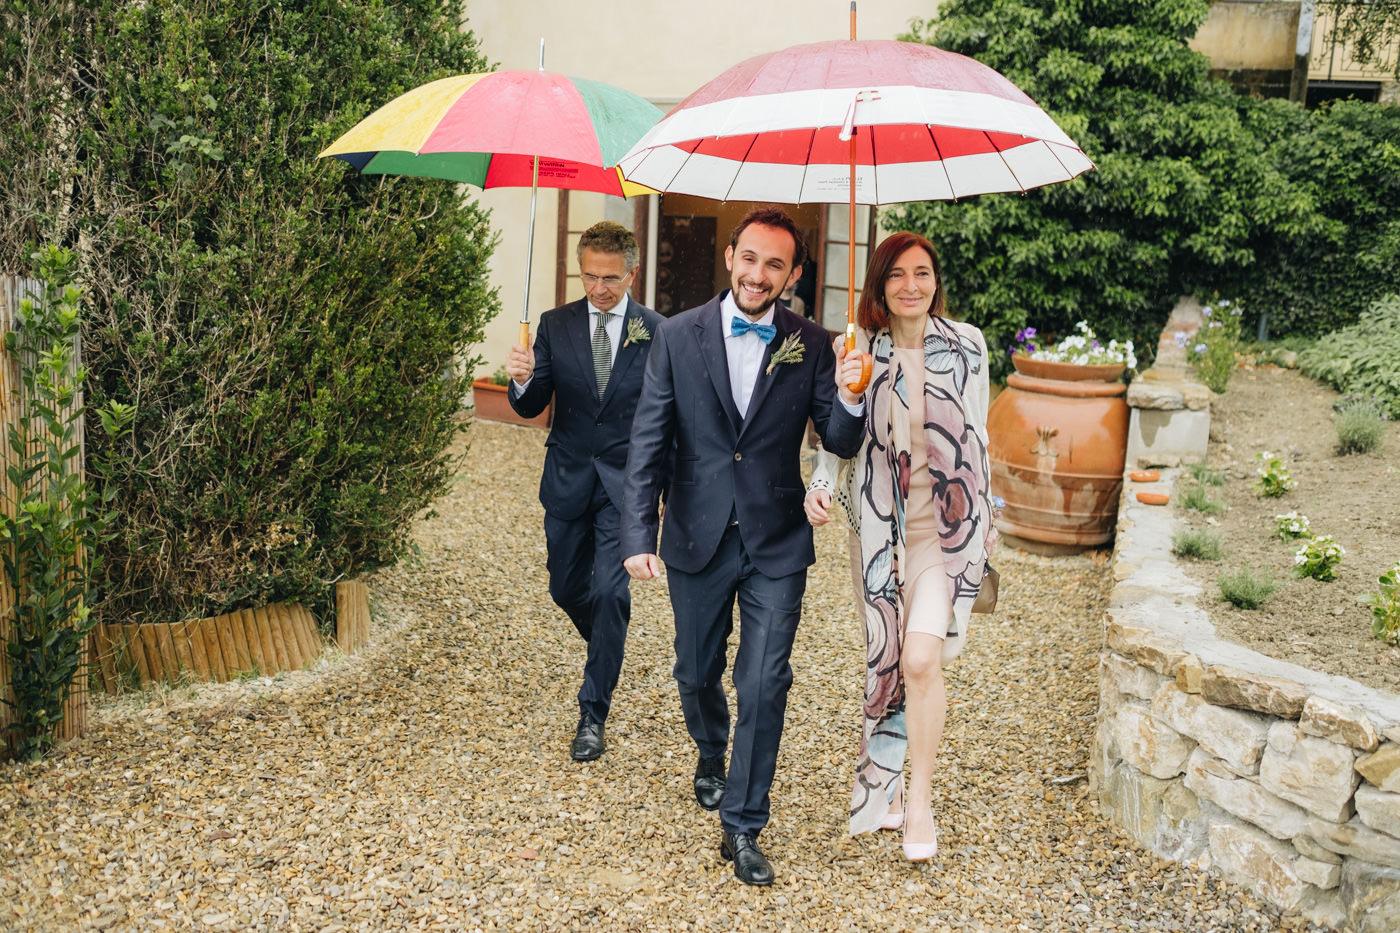 matrimoni_all_italiana_fotografo_matrimonio_toscana-21.jpg